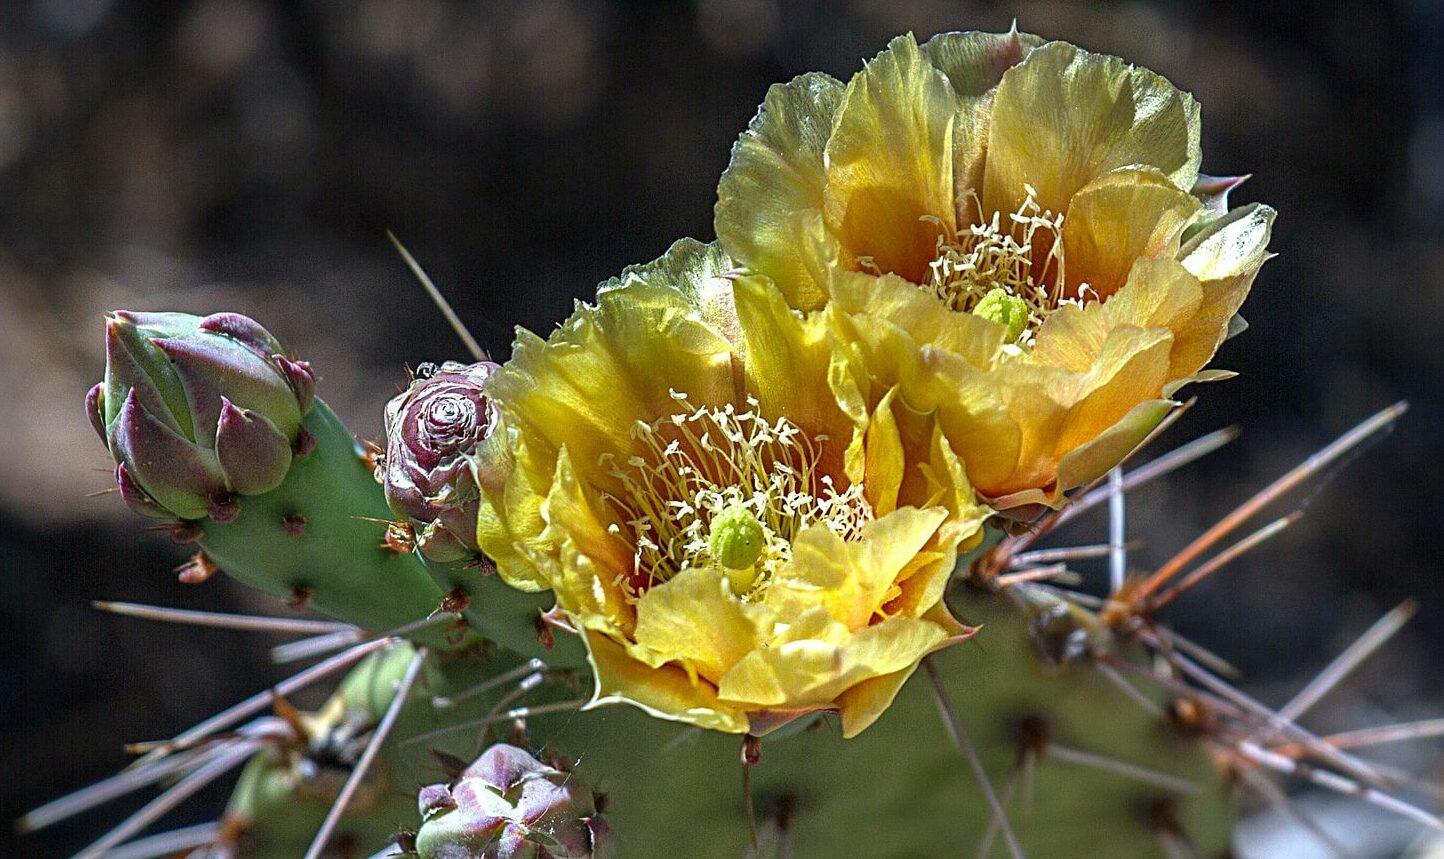 Grand Canyon National Park plant life